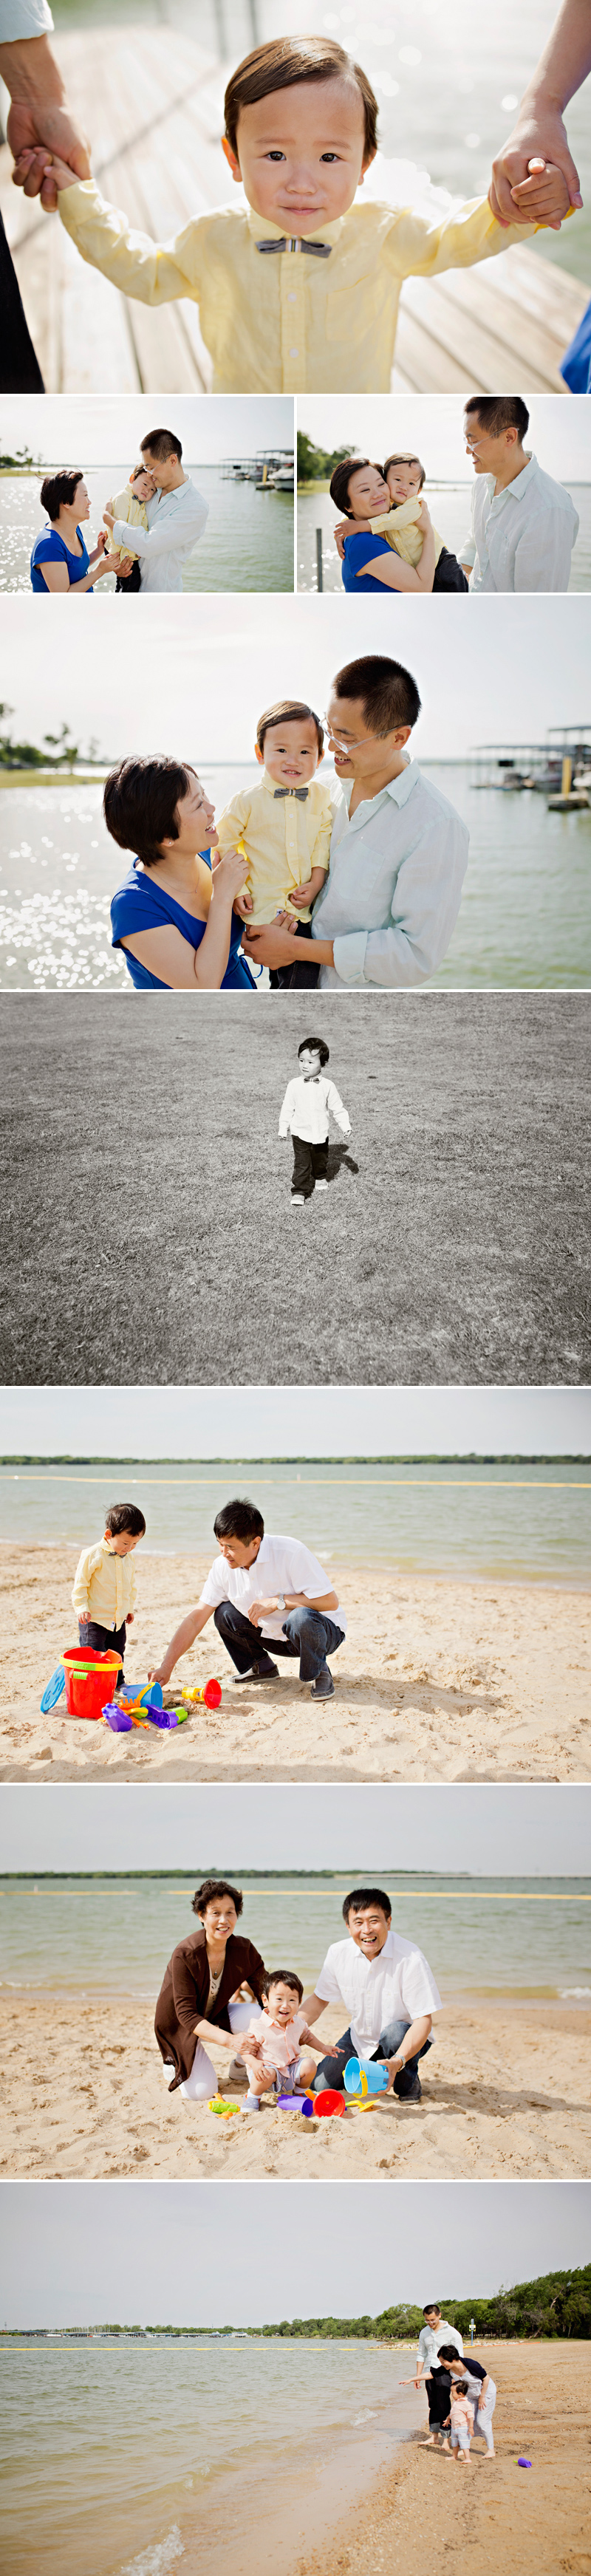 Dallas-Family-Photographercomp006